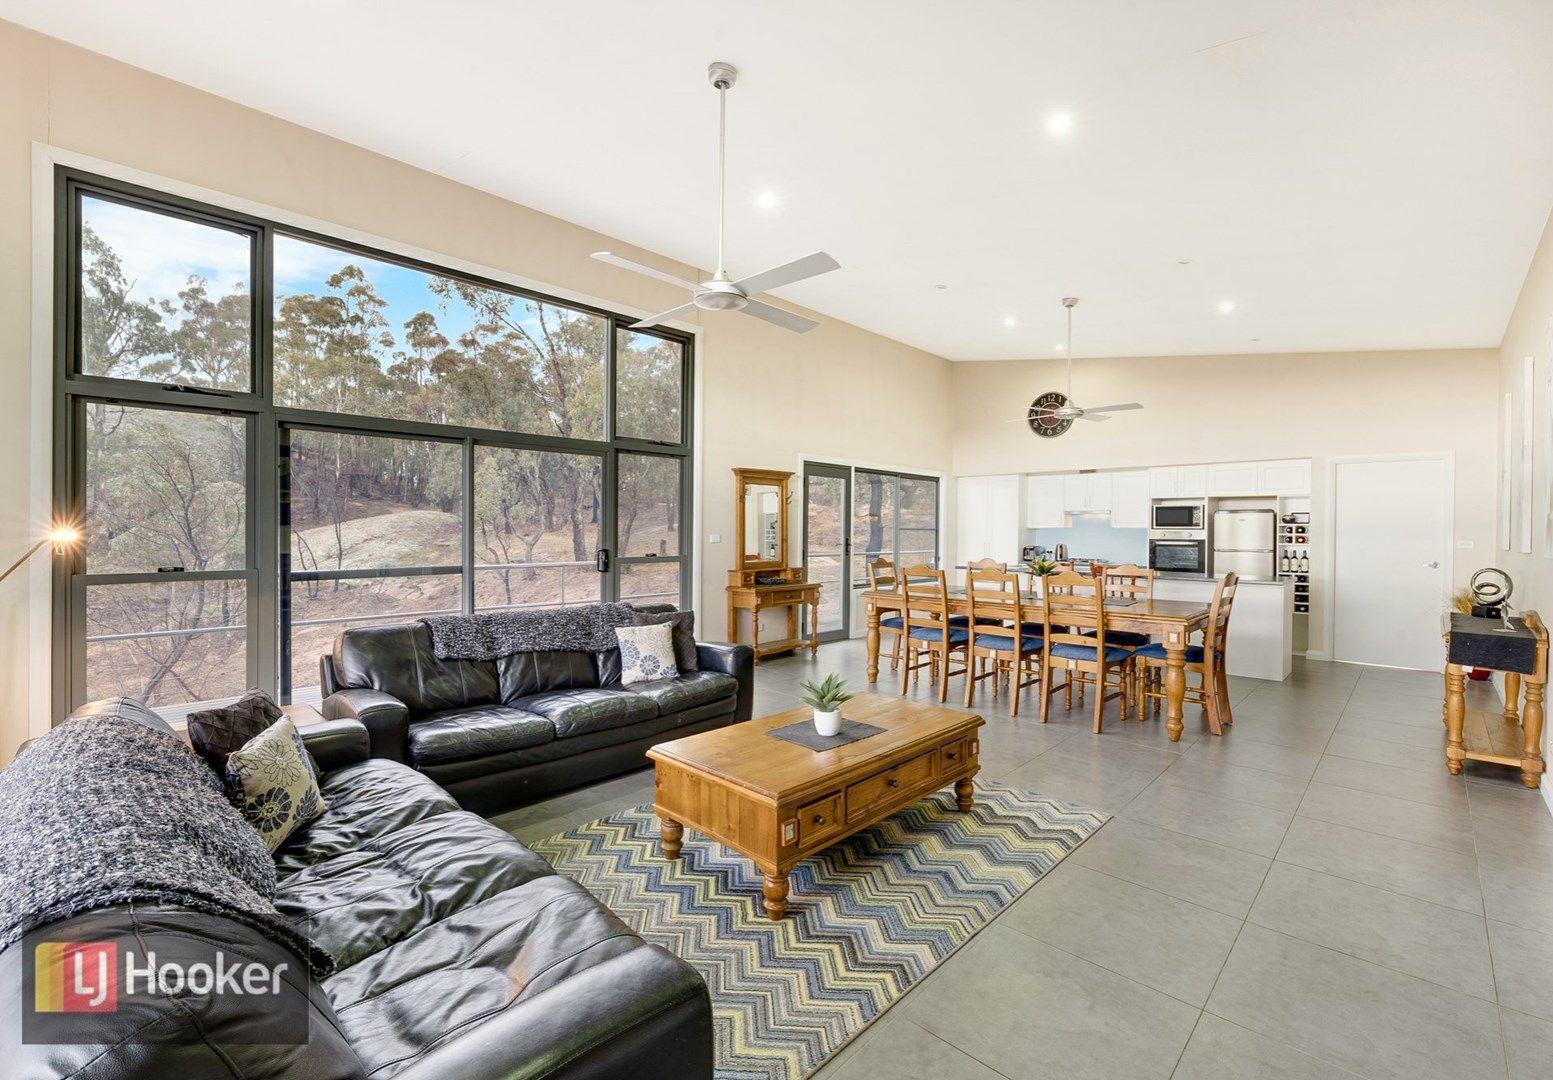 Lot 1/964 Hazelgrove Road, Oberon NSW 2787, Image 0